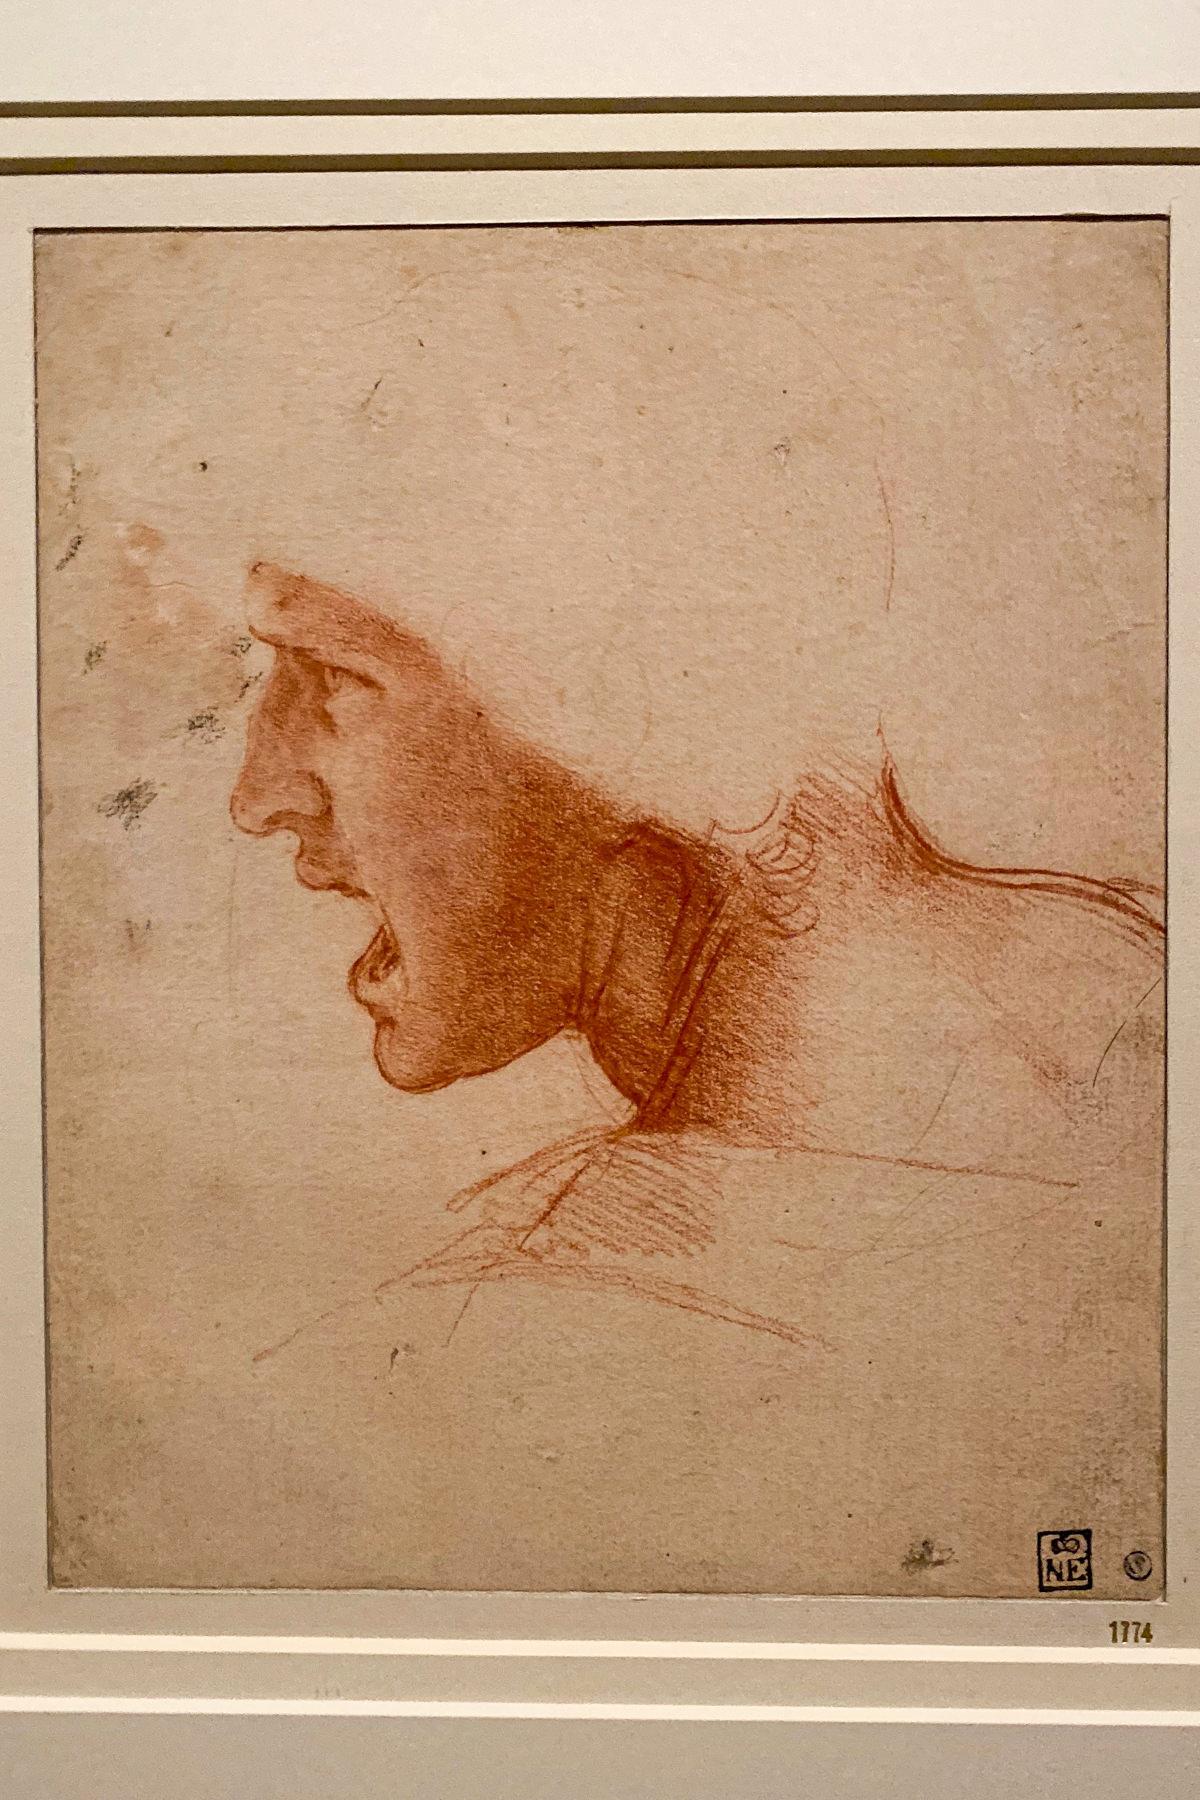 Leonardo da Vinci Exhibition in the Louvre Museum: Study for the Head of a Soldier in the Battle of Anghiari